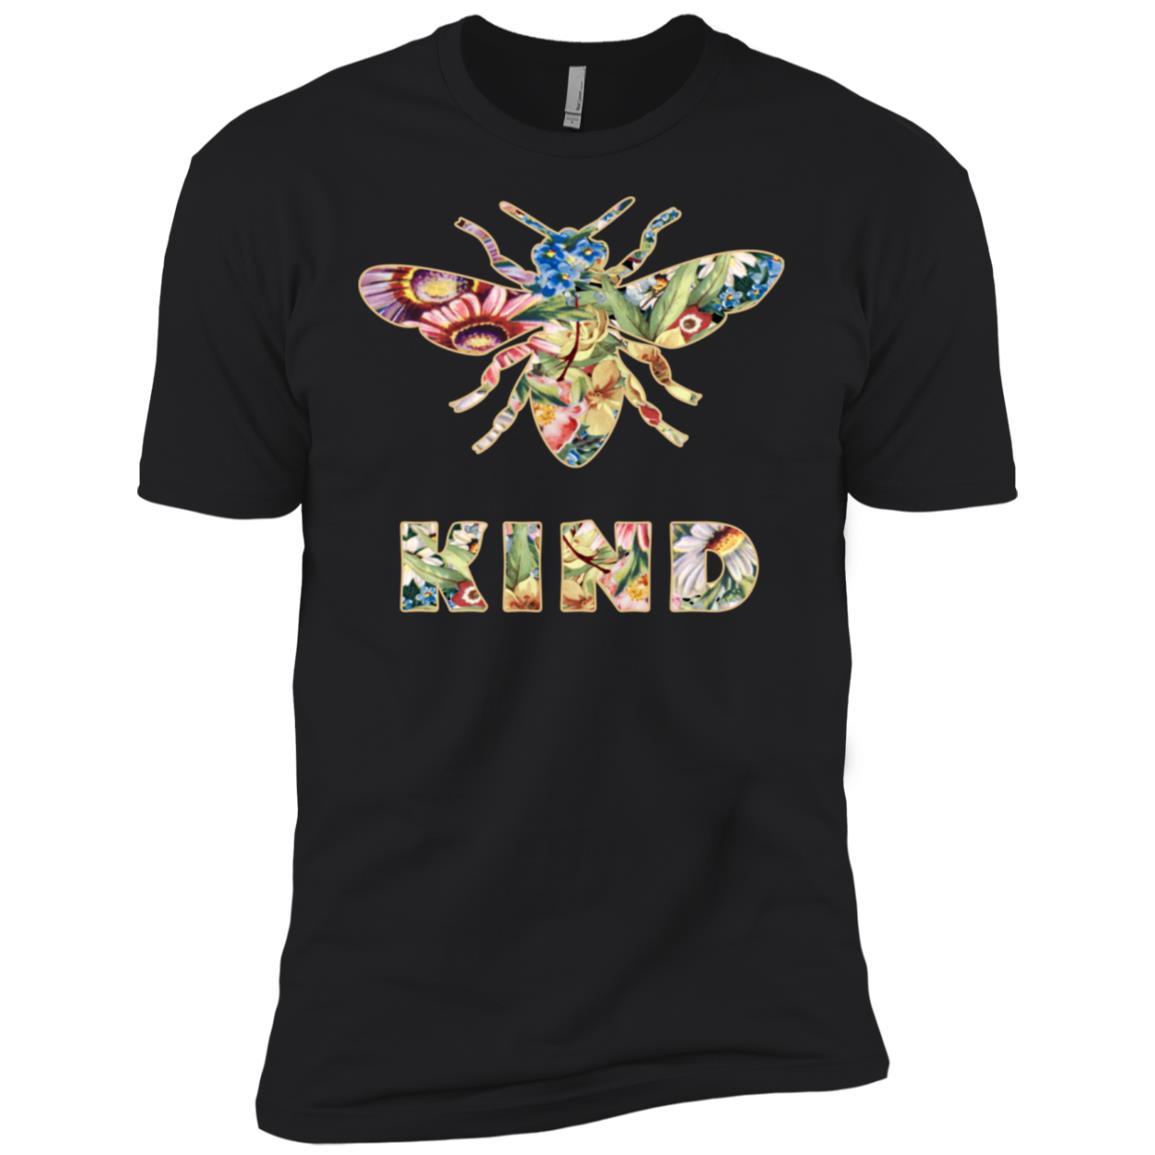 Bee kind Cute Bumble Bee Kindness Long -2 Men Short Sleeve T-Shirt